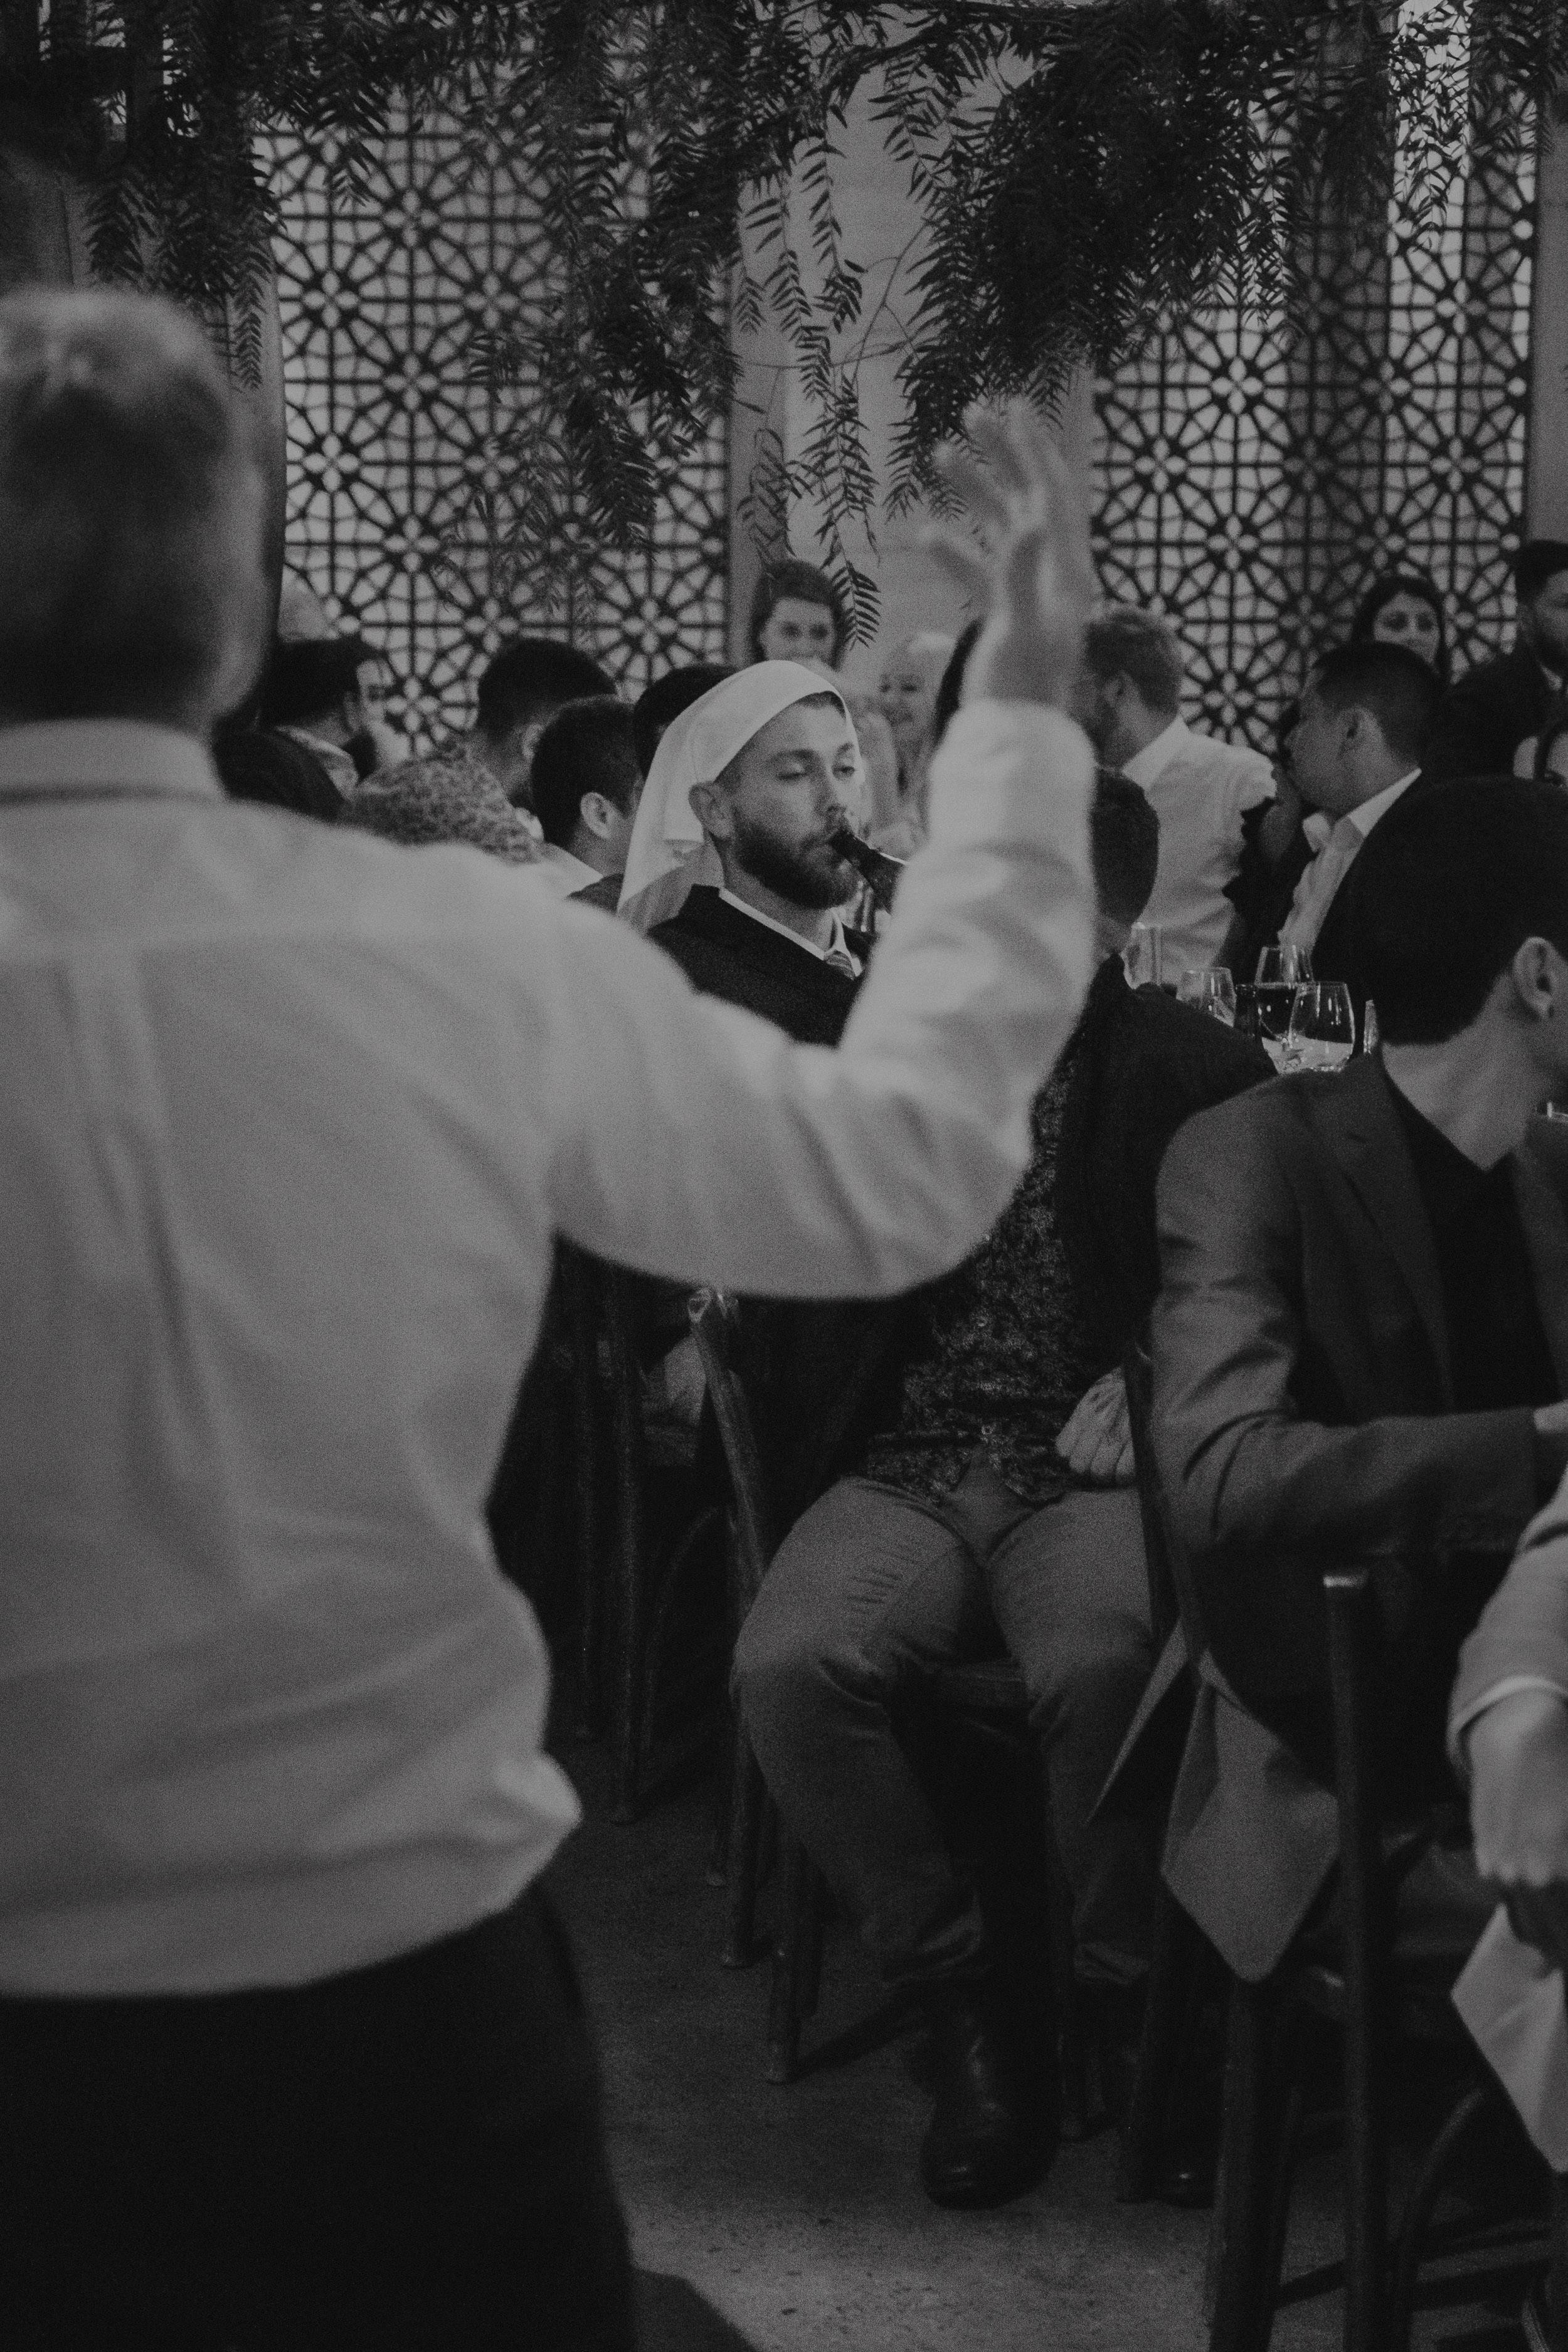 s+j_top_elopement wedding photography_kings & thieves_blog - 493.jpg